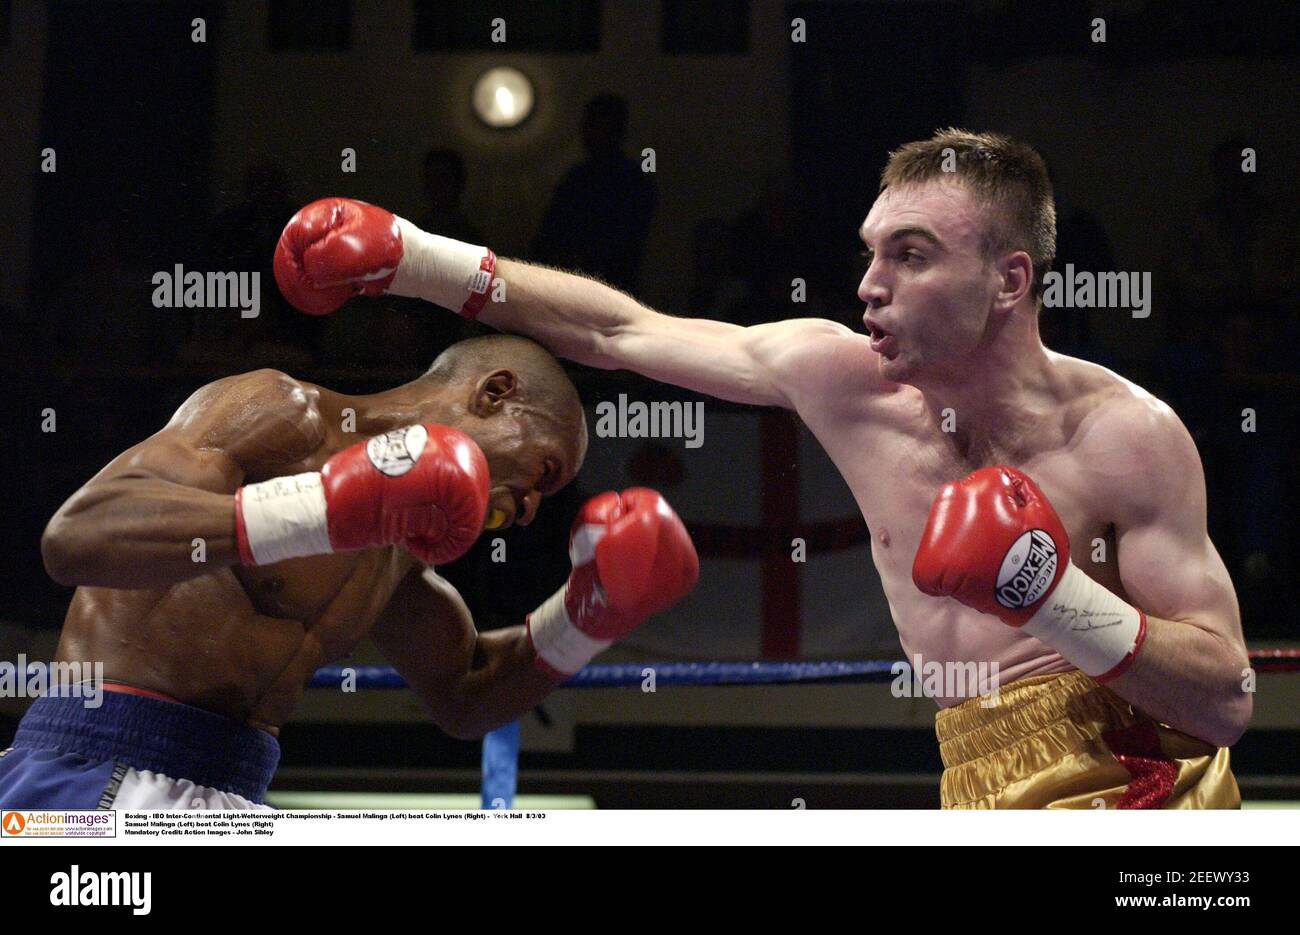 Boxeo - IBO Inter-Continental Light-Welterweight Championship - Samuel Malinga (izquierda) venció a Colin Lynes (derecha) - York Hall 8/3/03 Samuel Malinga (izquierda) venció a Colin Lynes (derecha) crédito obligatorio: Acción Imágenes - John Sibley Foto de stock